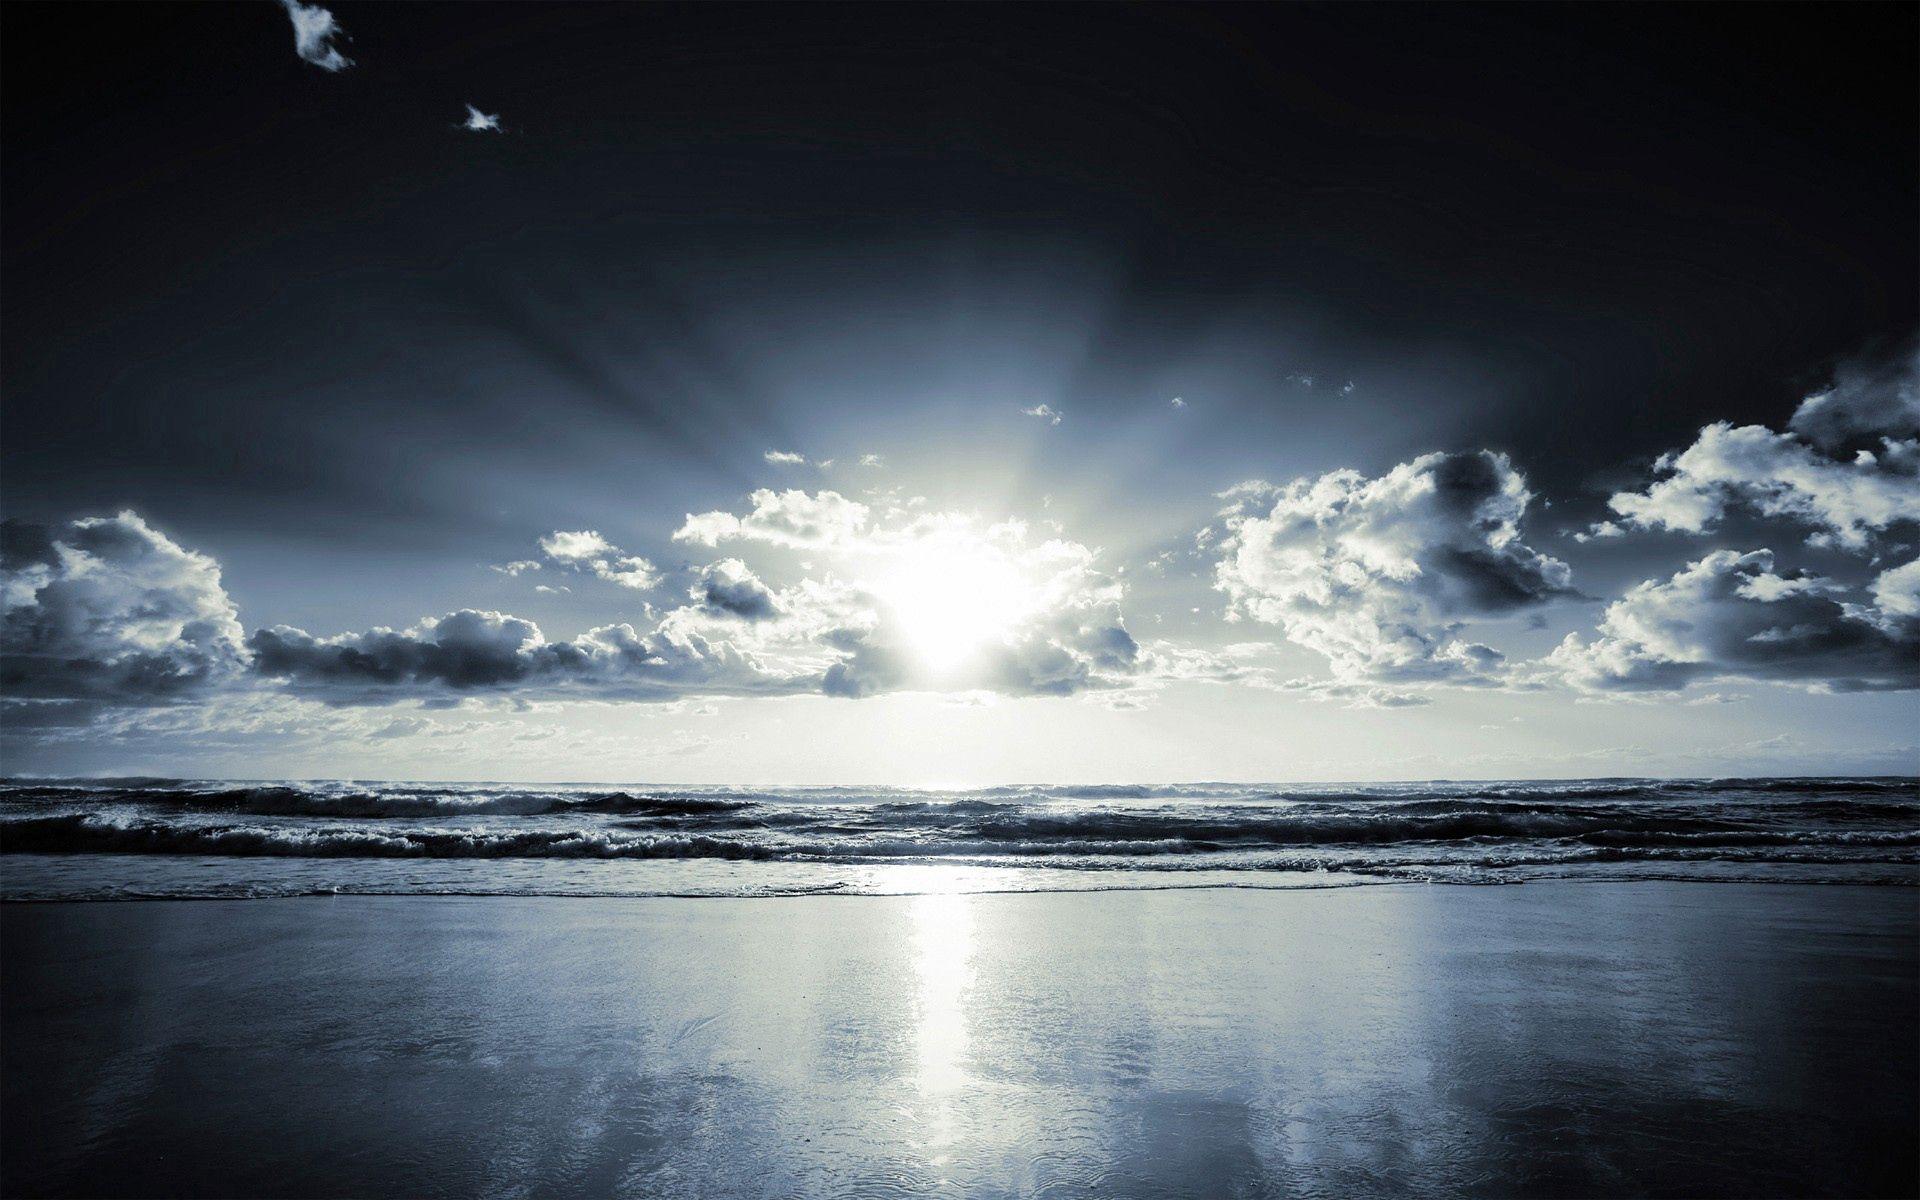 70187 baixar papel de parede Natureza, Costa, Banco, Praia, Nuvens, Feixes, Raios, Areia, Preto E Branco, Sol - protetores de tela e imagens gratuitamente